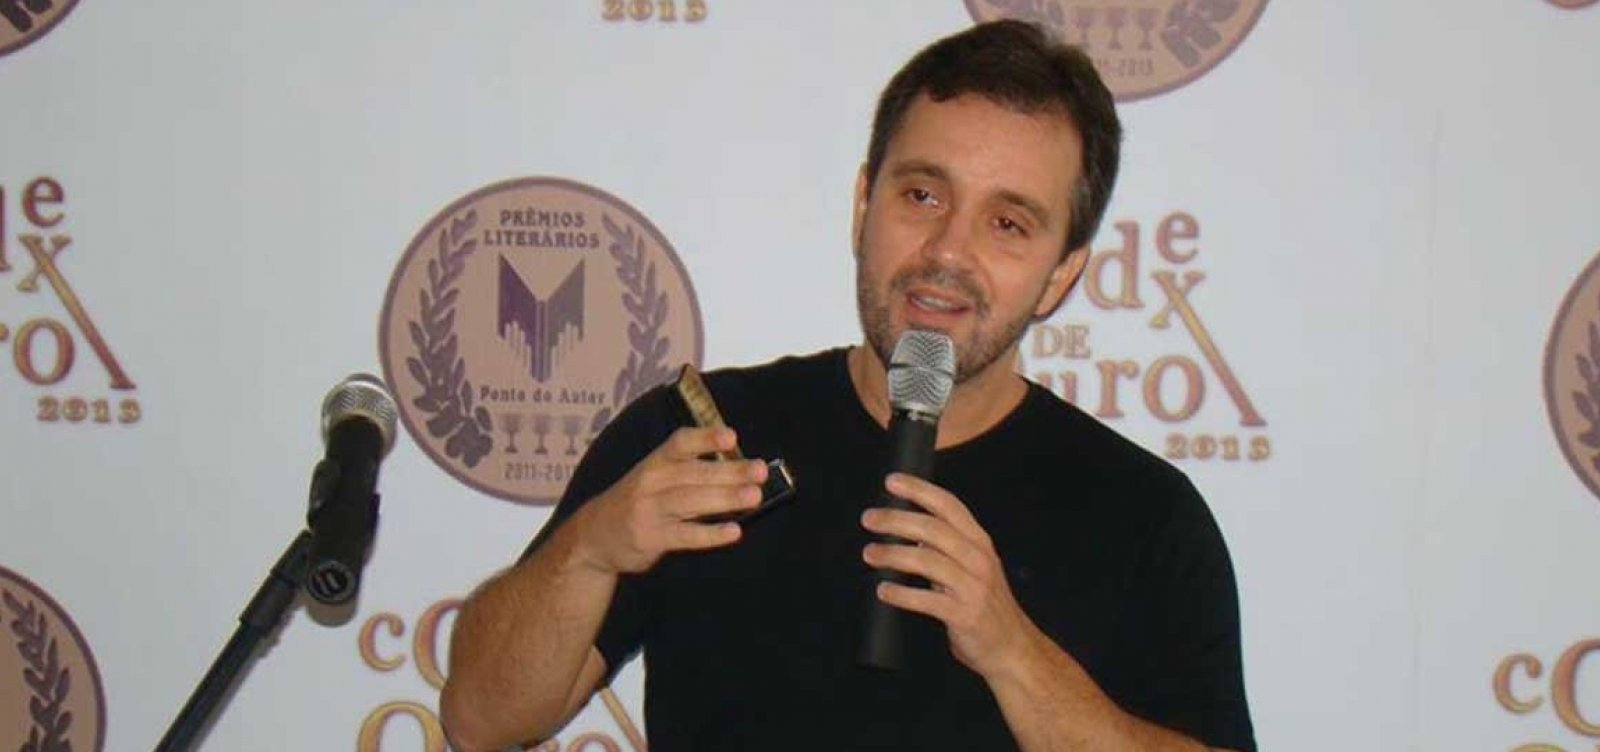 [Bolsonaro aparece como 'herói' contra o petismo, analisa jornalista]